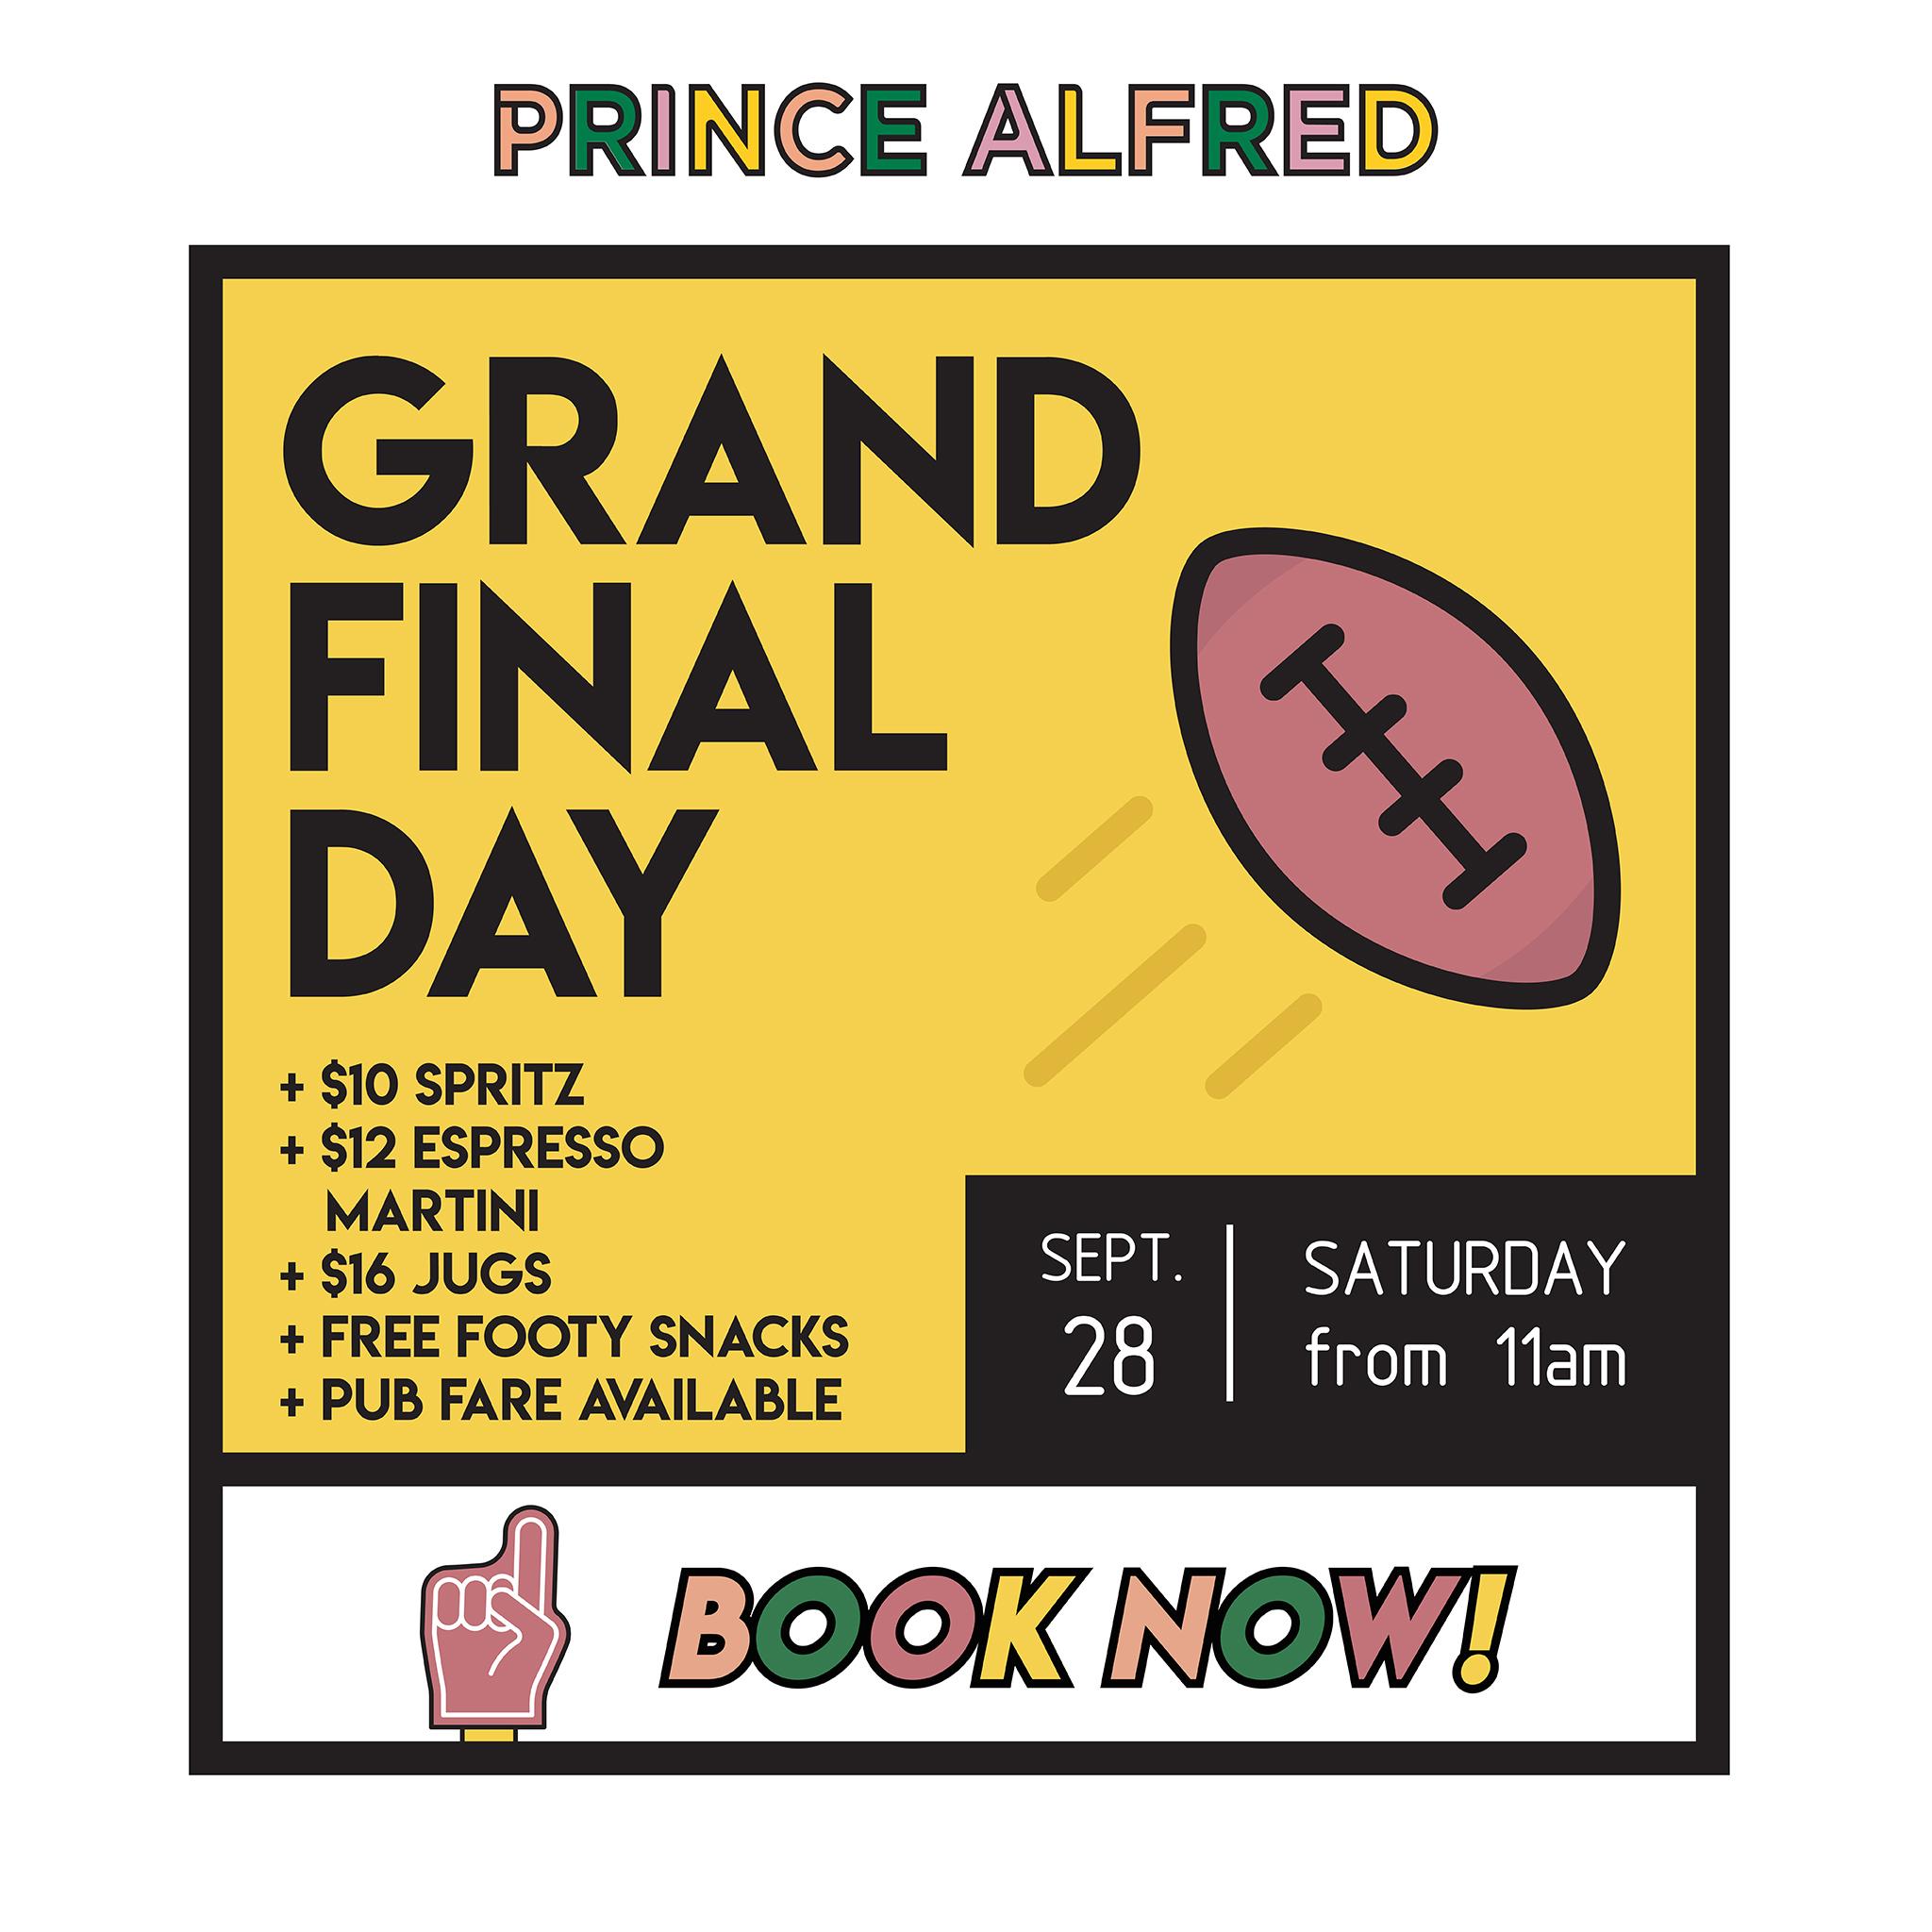 506663_Prince Alfred Grand Final Day_SquareSocialPost_082319.jpg